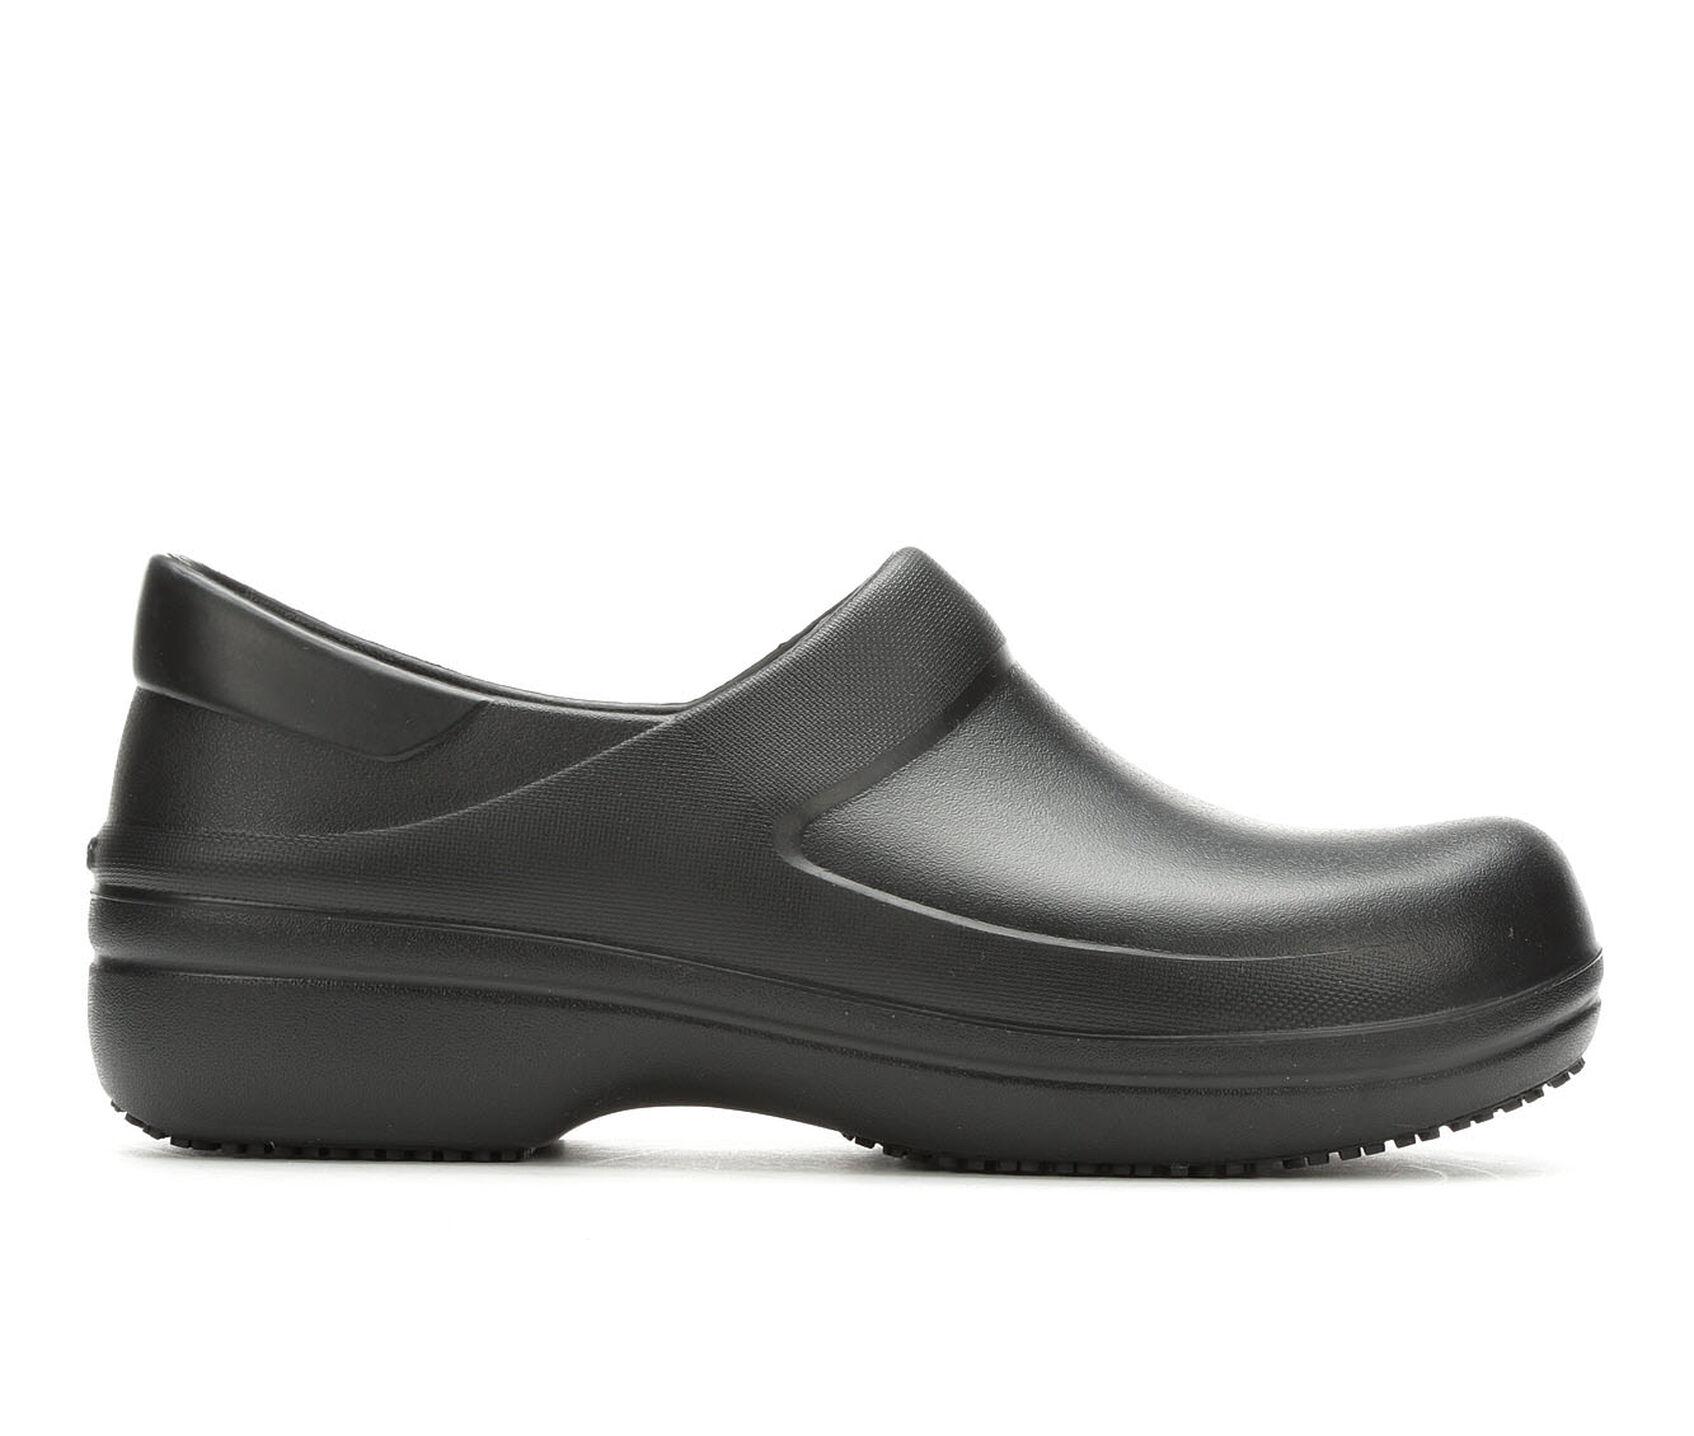 fd9655f0043b ... Crocs Work Neria Pro II Clog Slip-Resistant Shoes. Previous